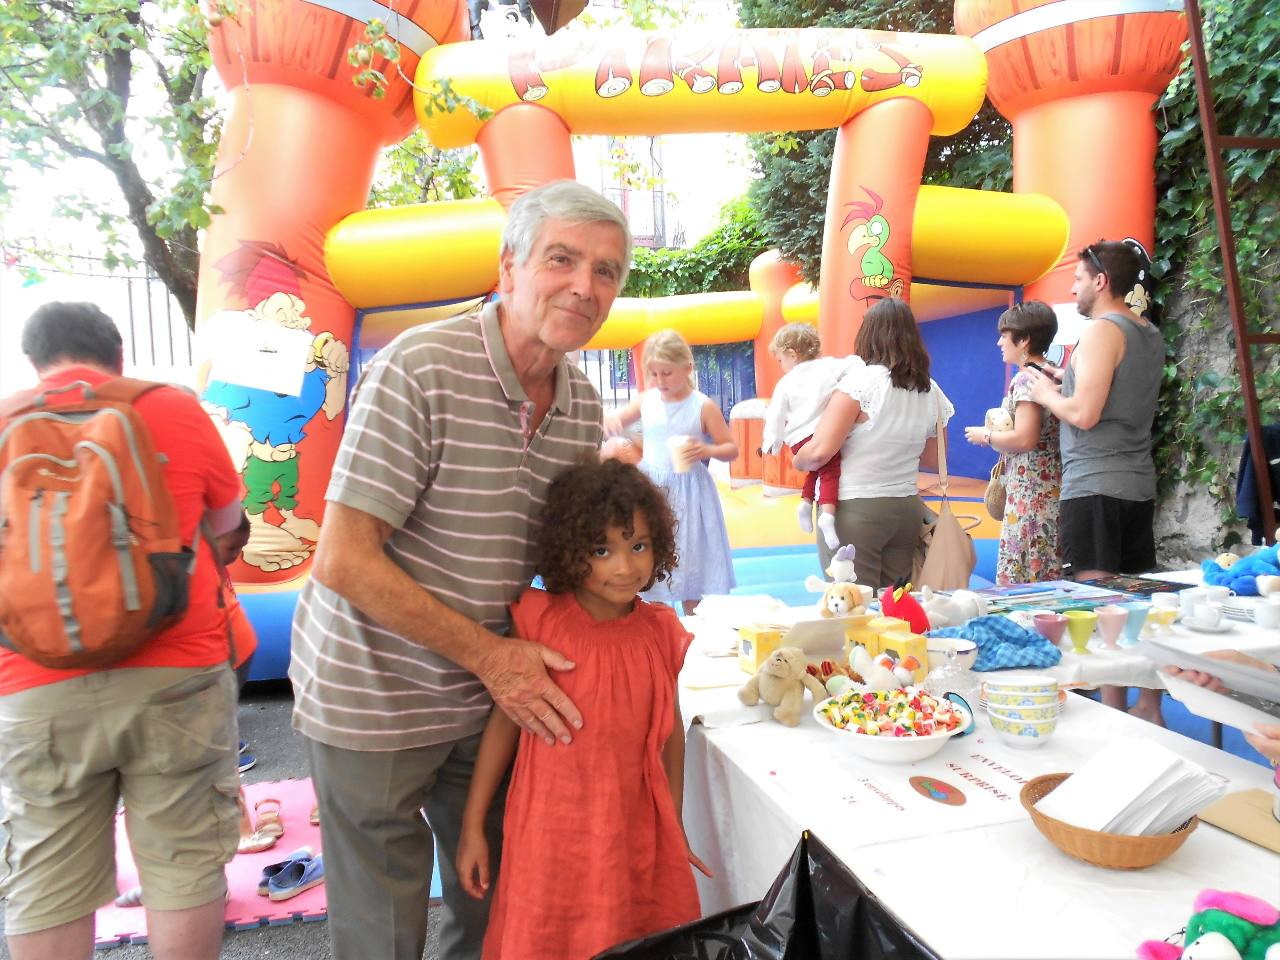 Gilbert, le grand timonier de la kermesse avec sa petite fille Elena